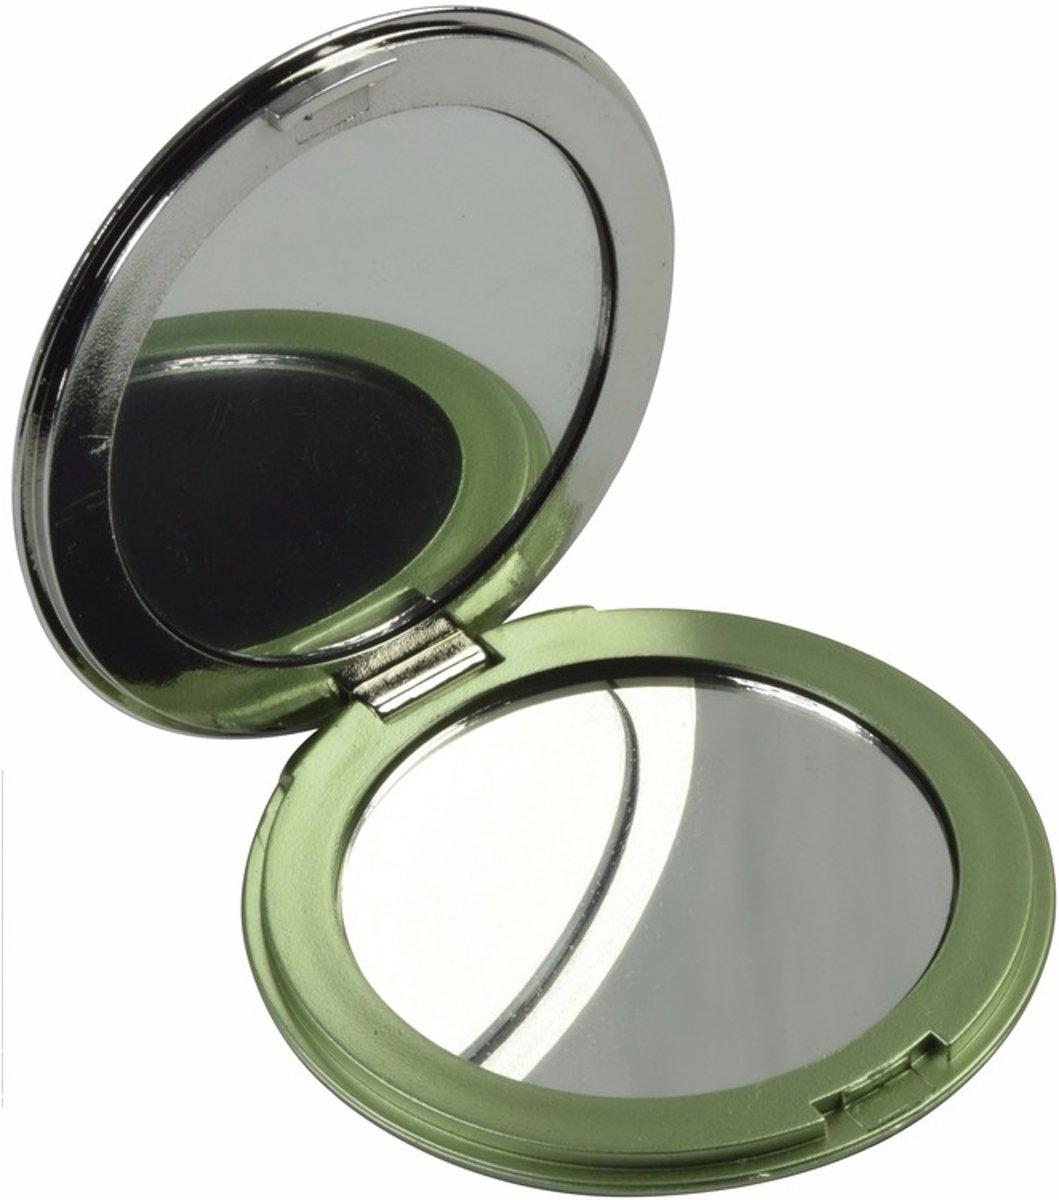 Zak spiegeltje groen - make up spiegel